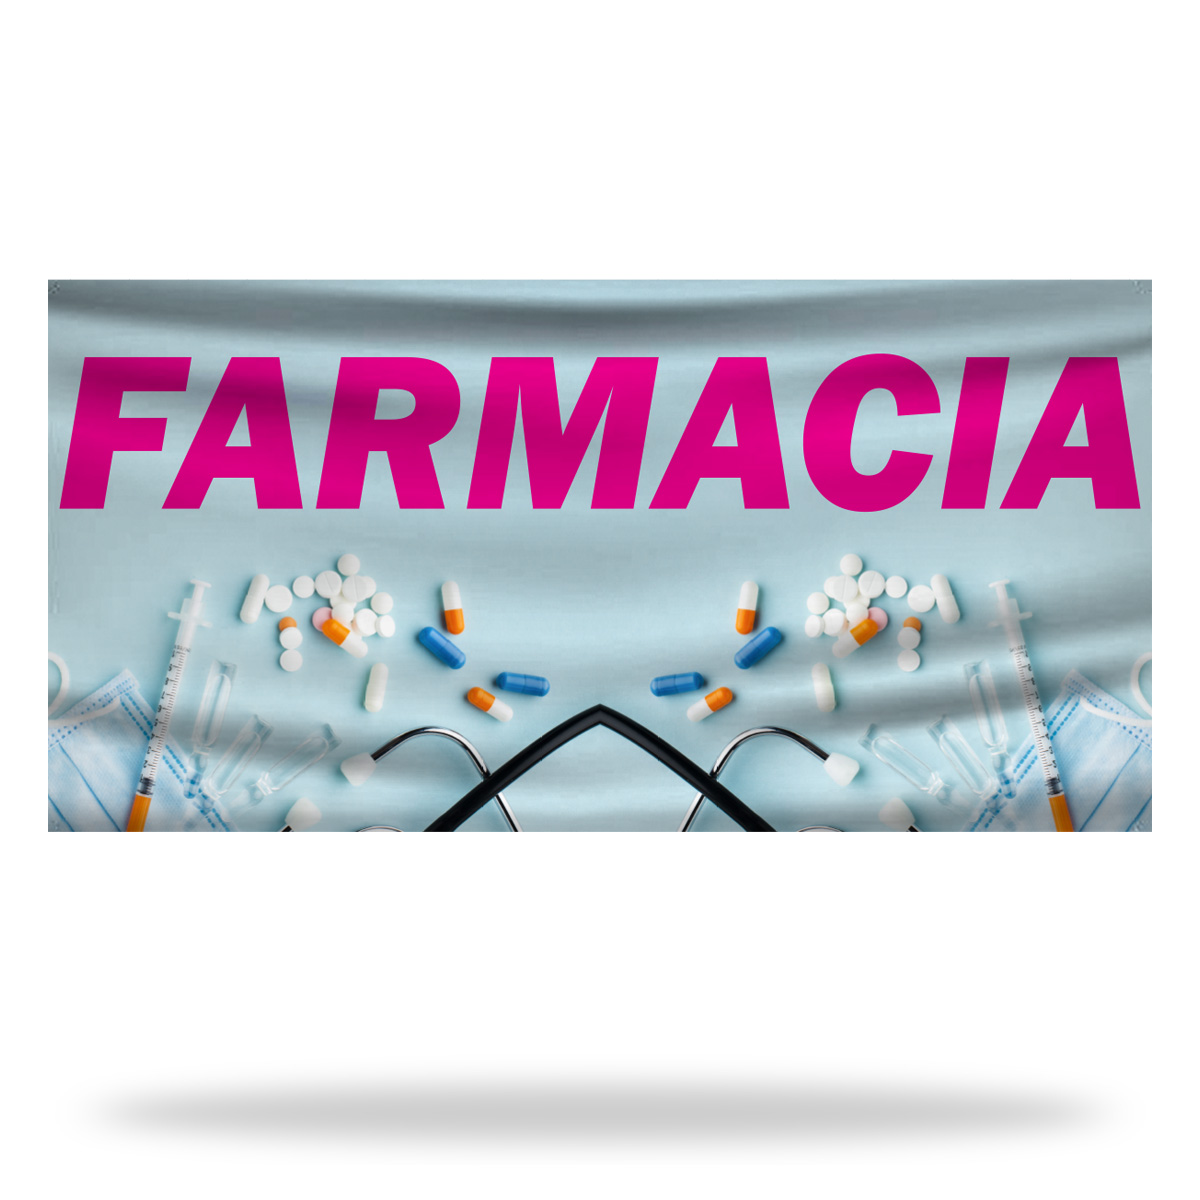 Spanish Pharmacy Flags & Banners Design 02